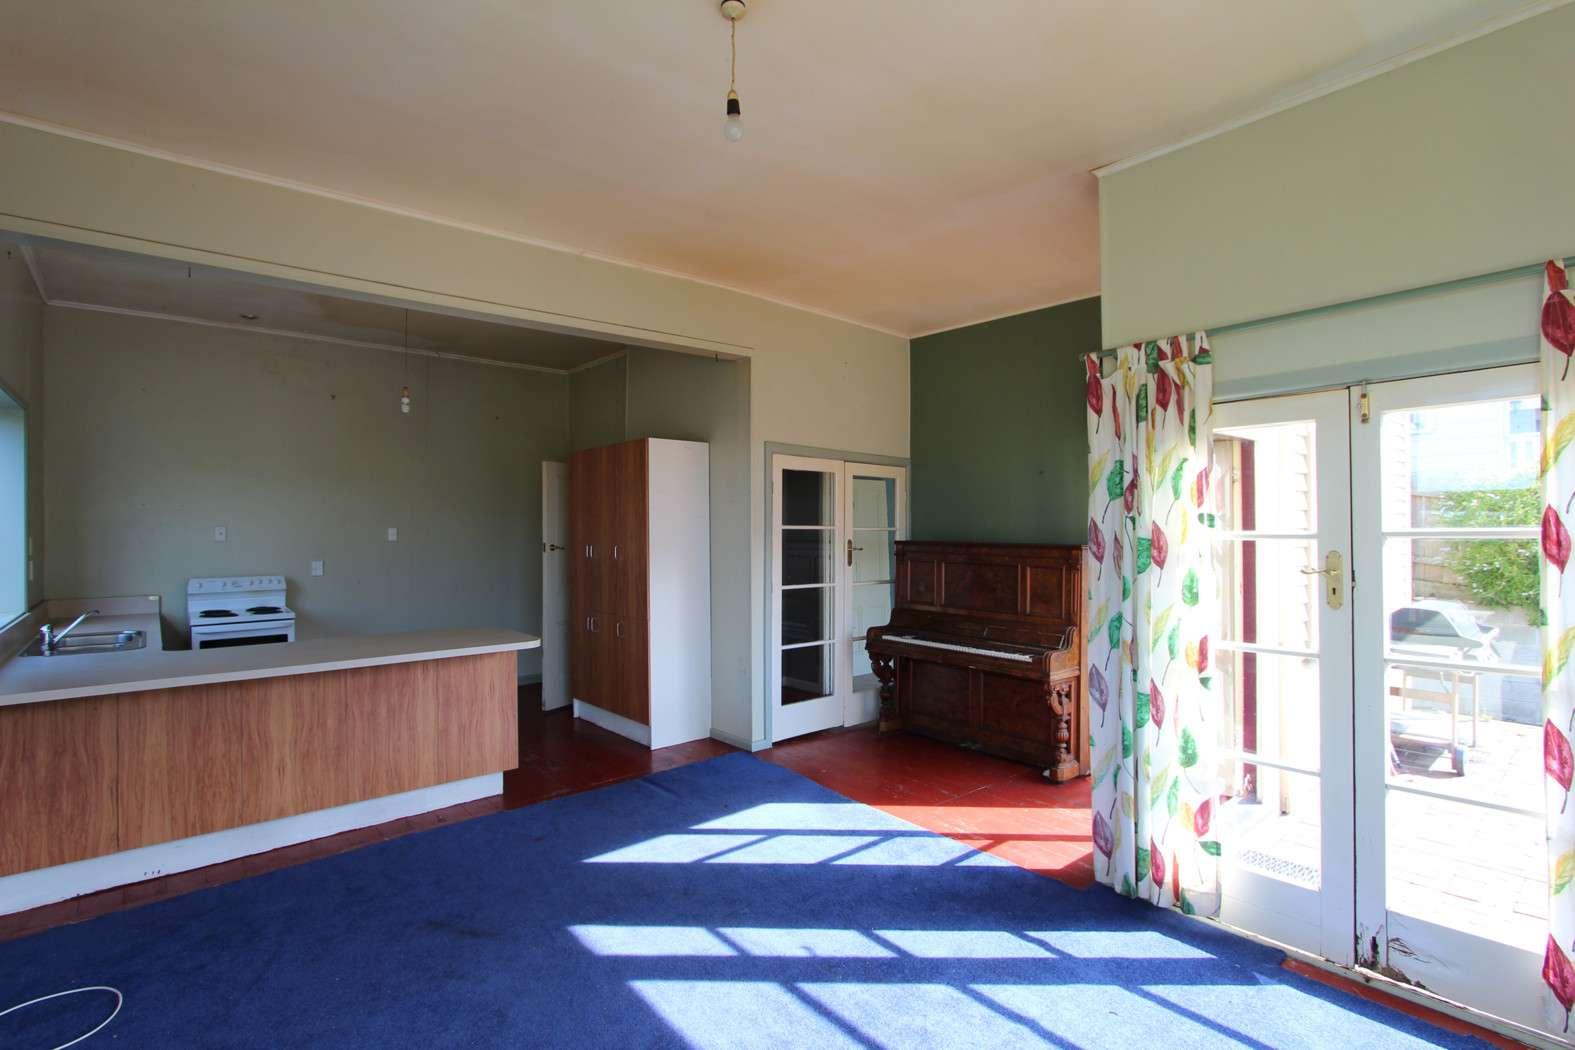 29 Dublin Street, LYTTELTON, Christchurch City 8082